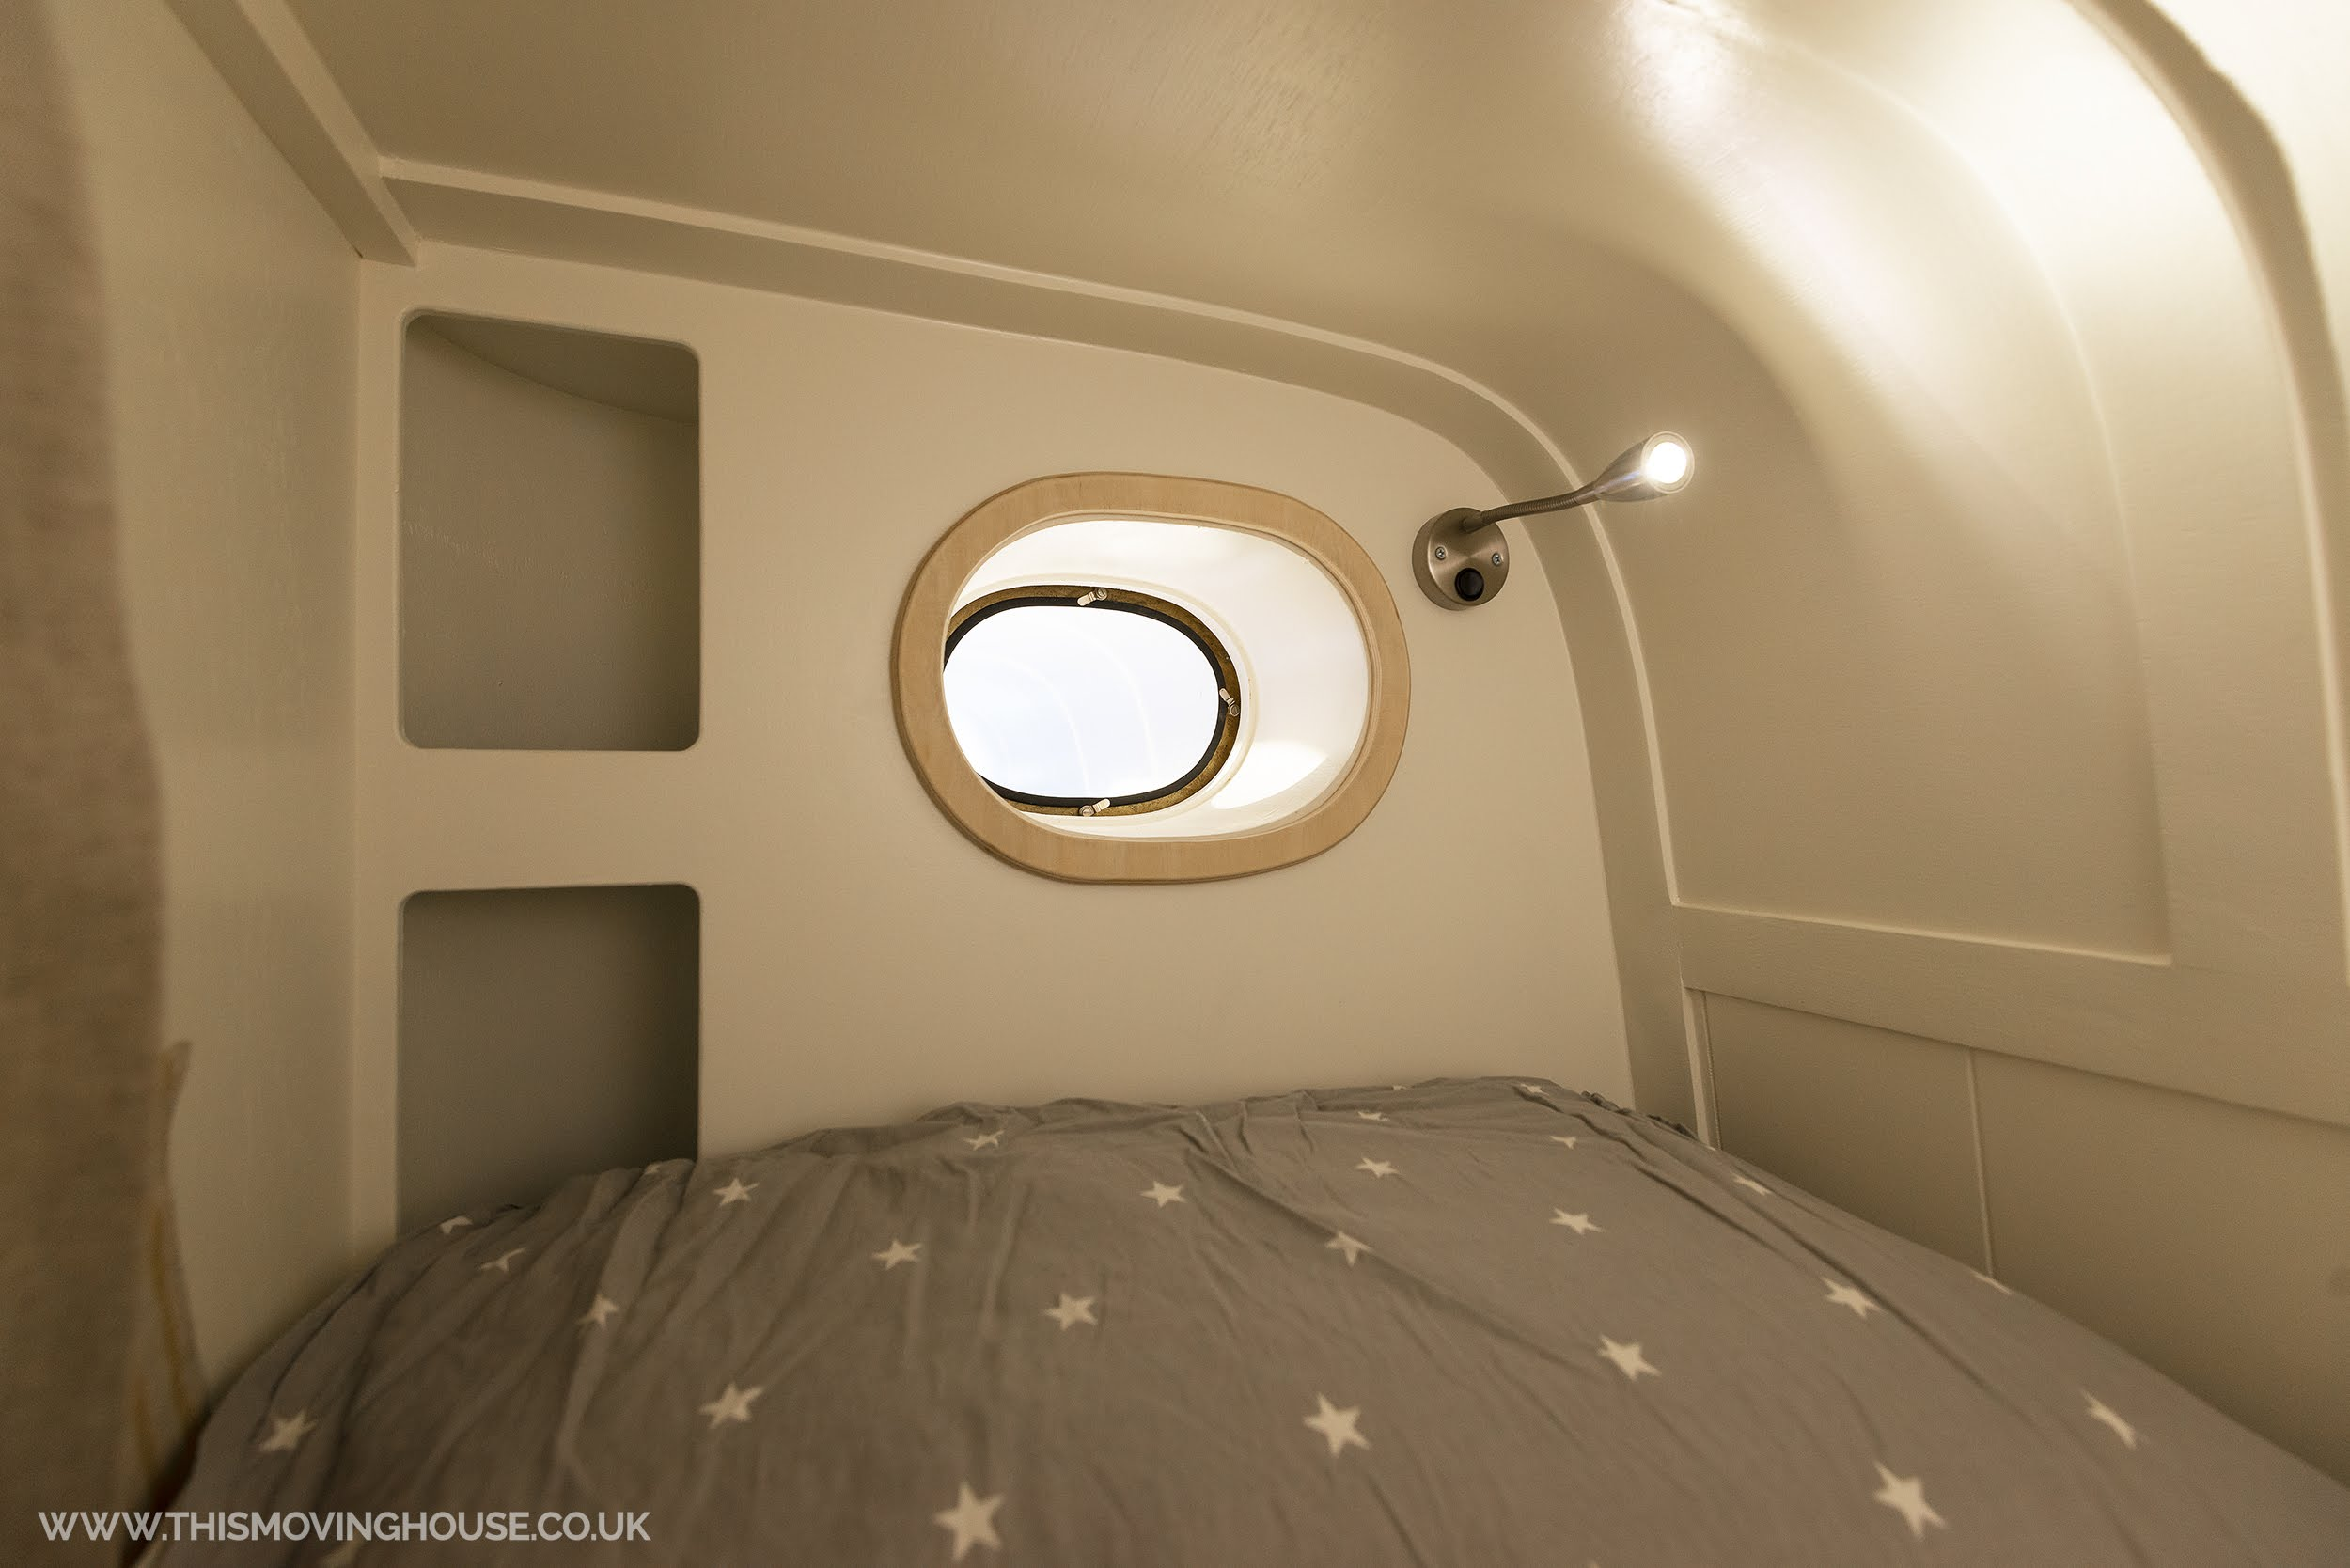 bunk bed in a bespoke camper van build